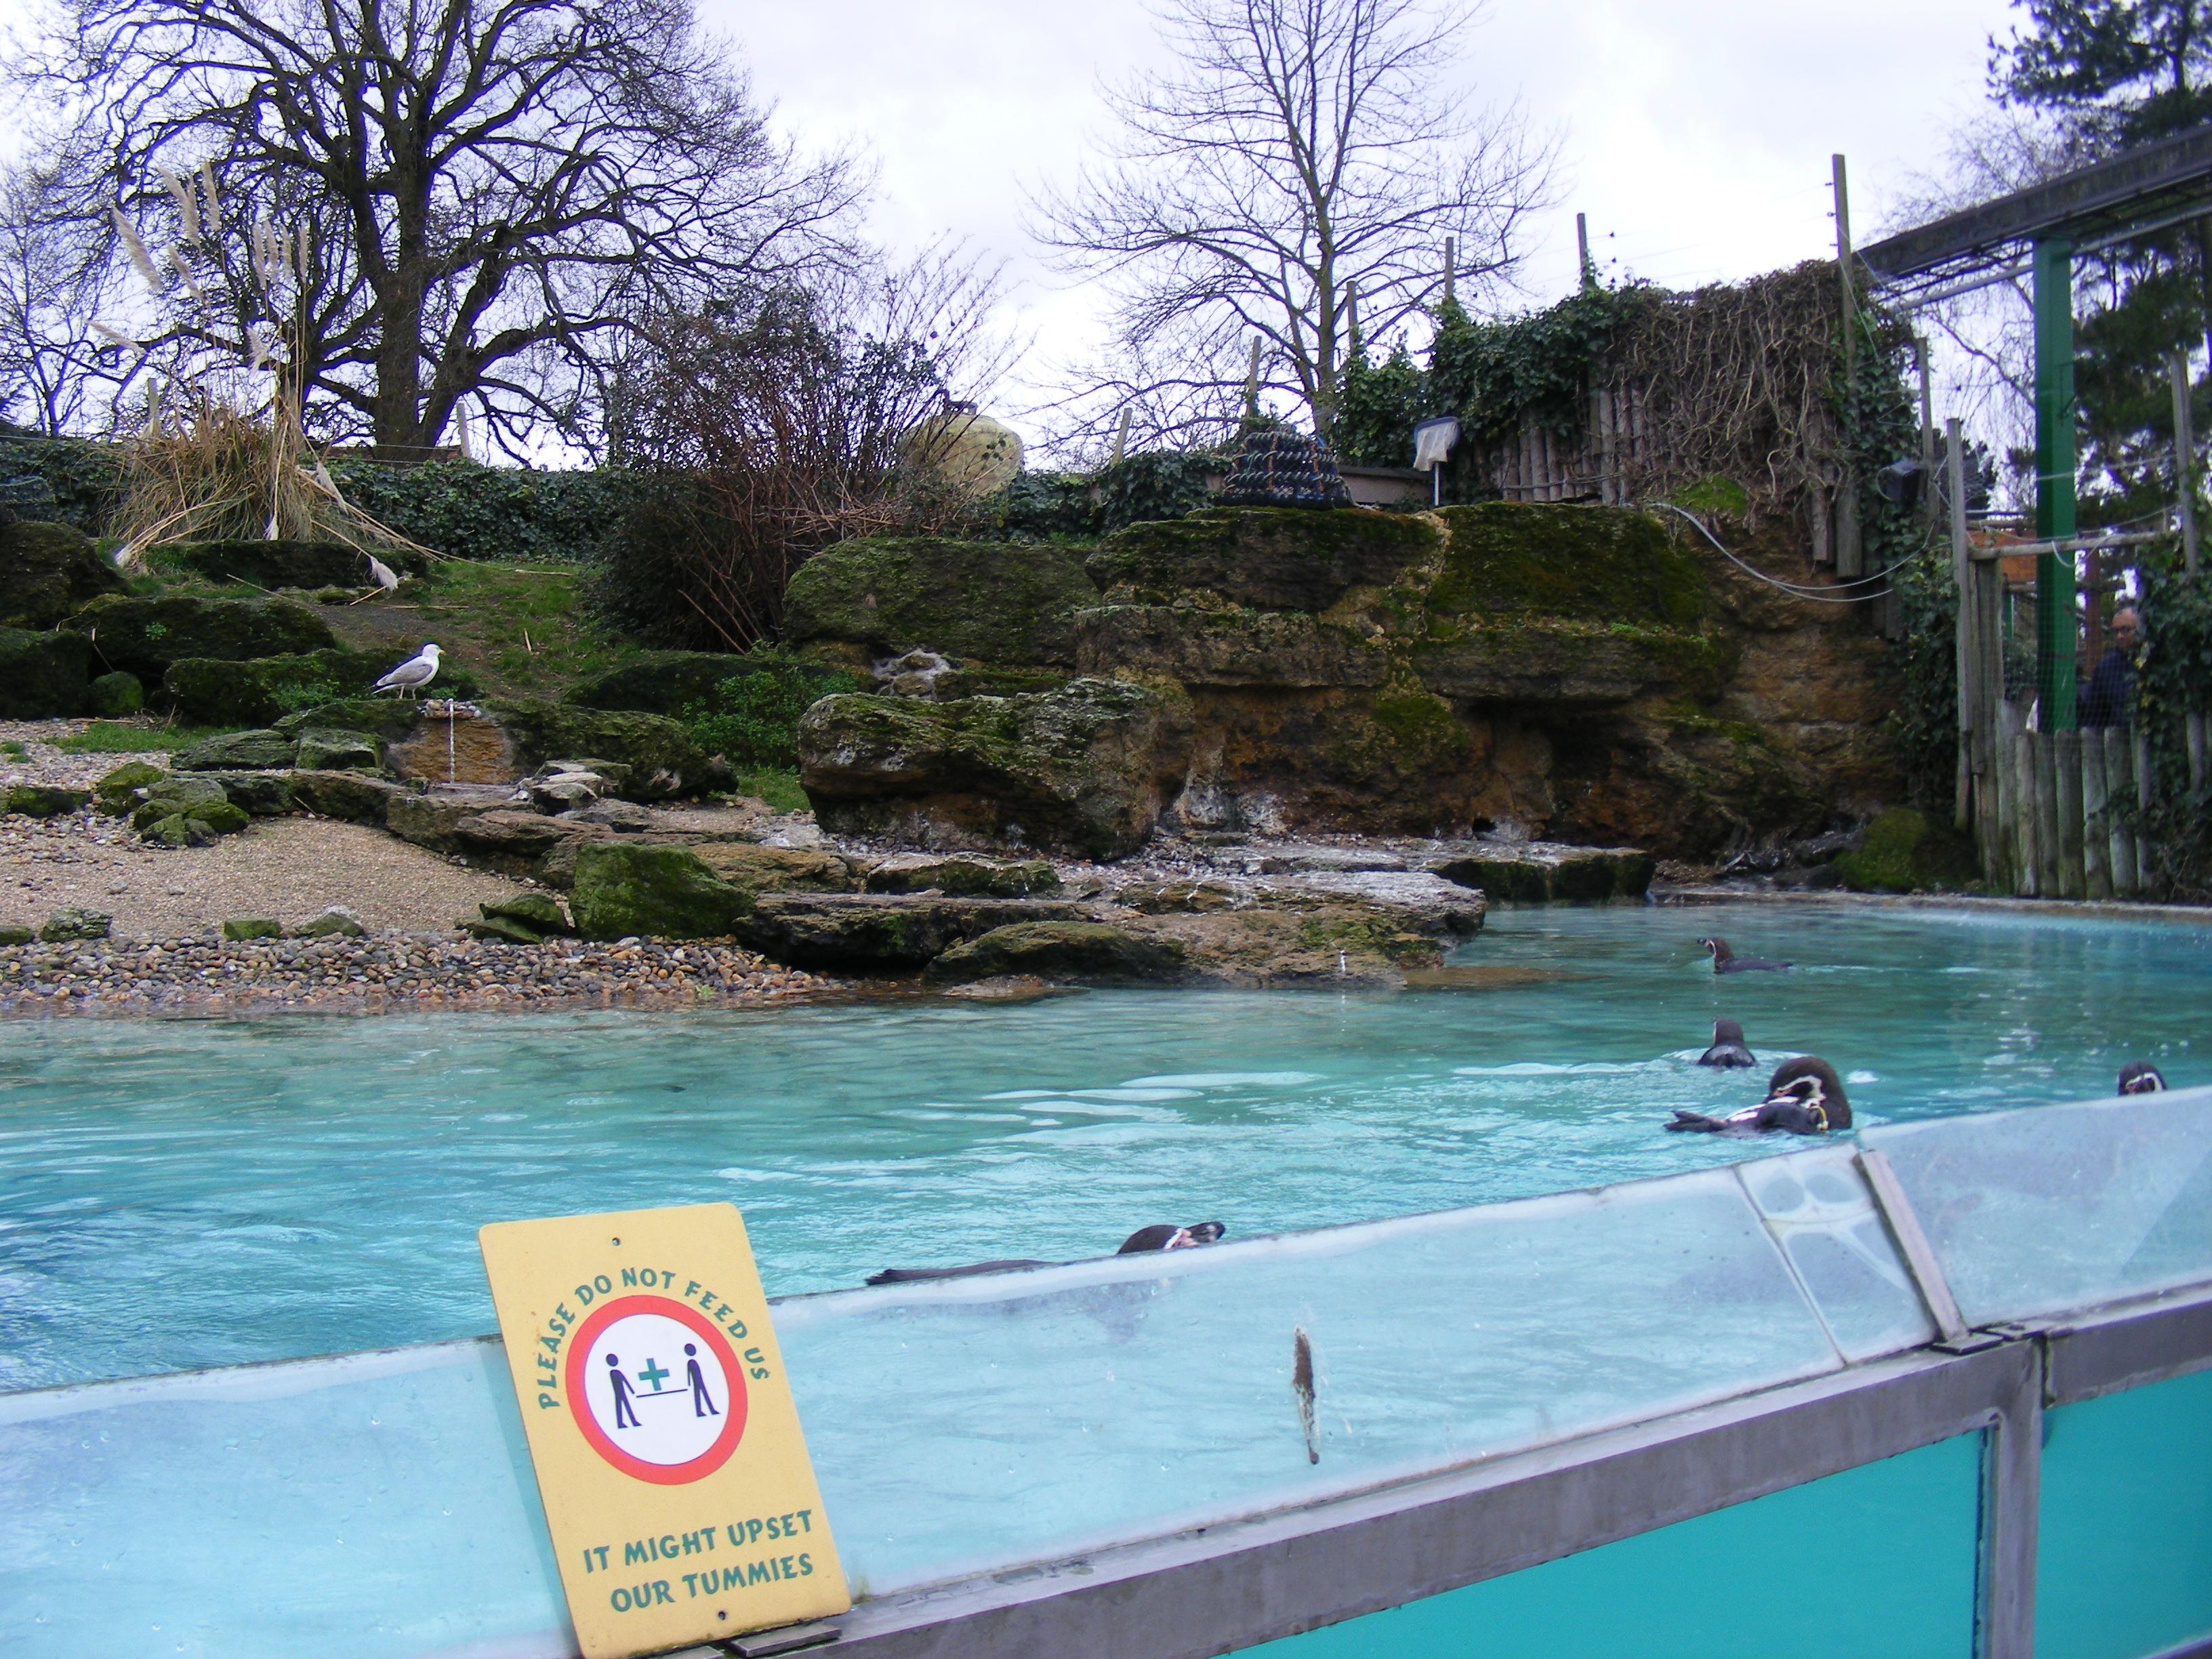 Humboldt's penguin enclosure at Chessington Zoo, Surrey